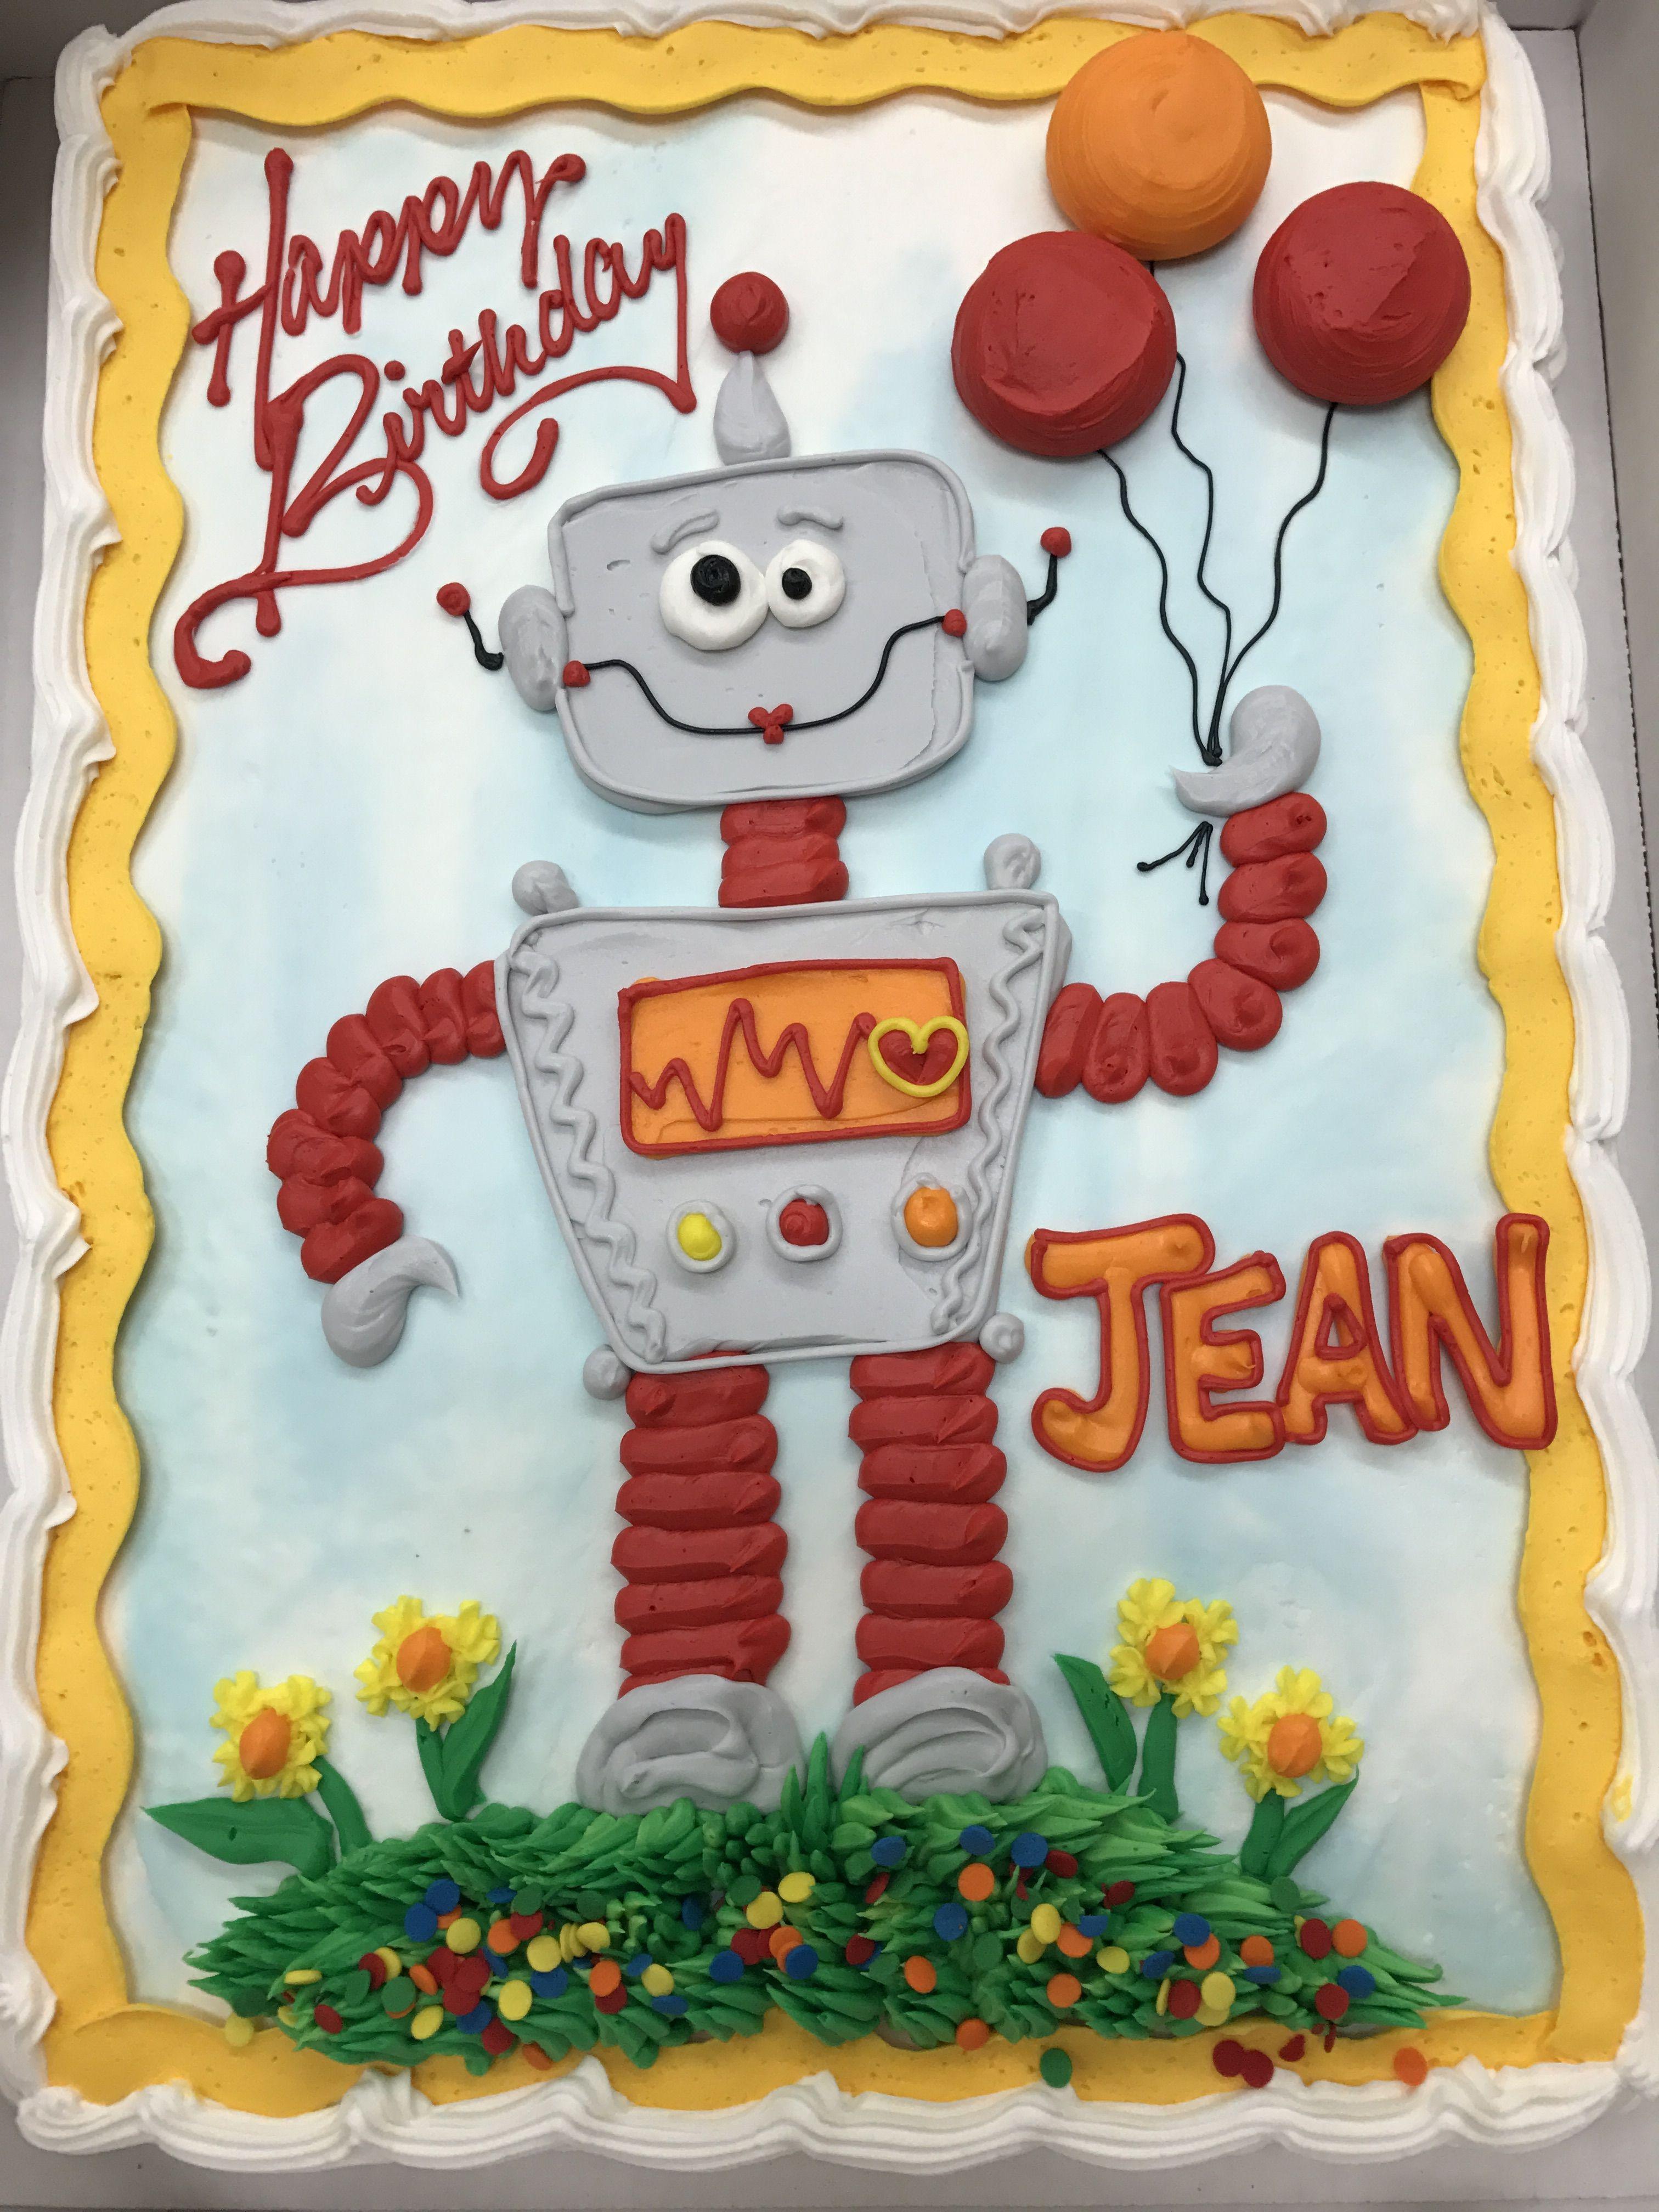 Remarkable Robot Cake Aj Birthday Sheet Cakes Cartoon Birthday Cake Personalised Birthday Cards Epsylily Jamesorg